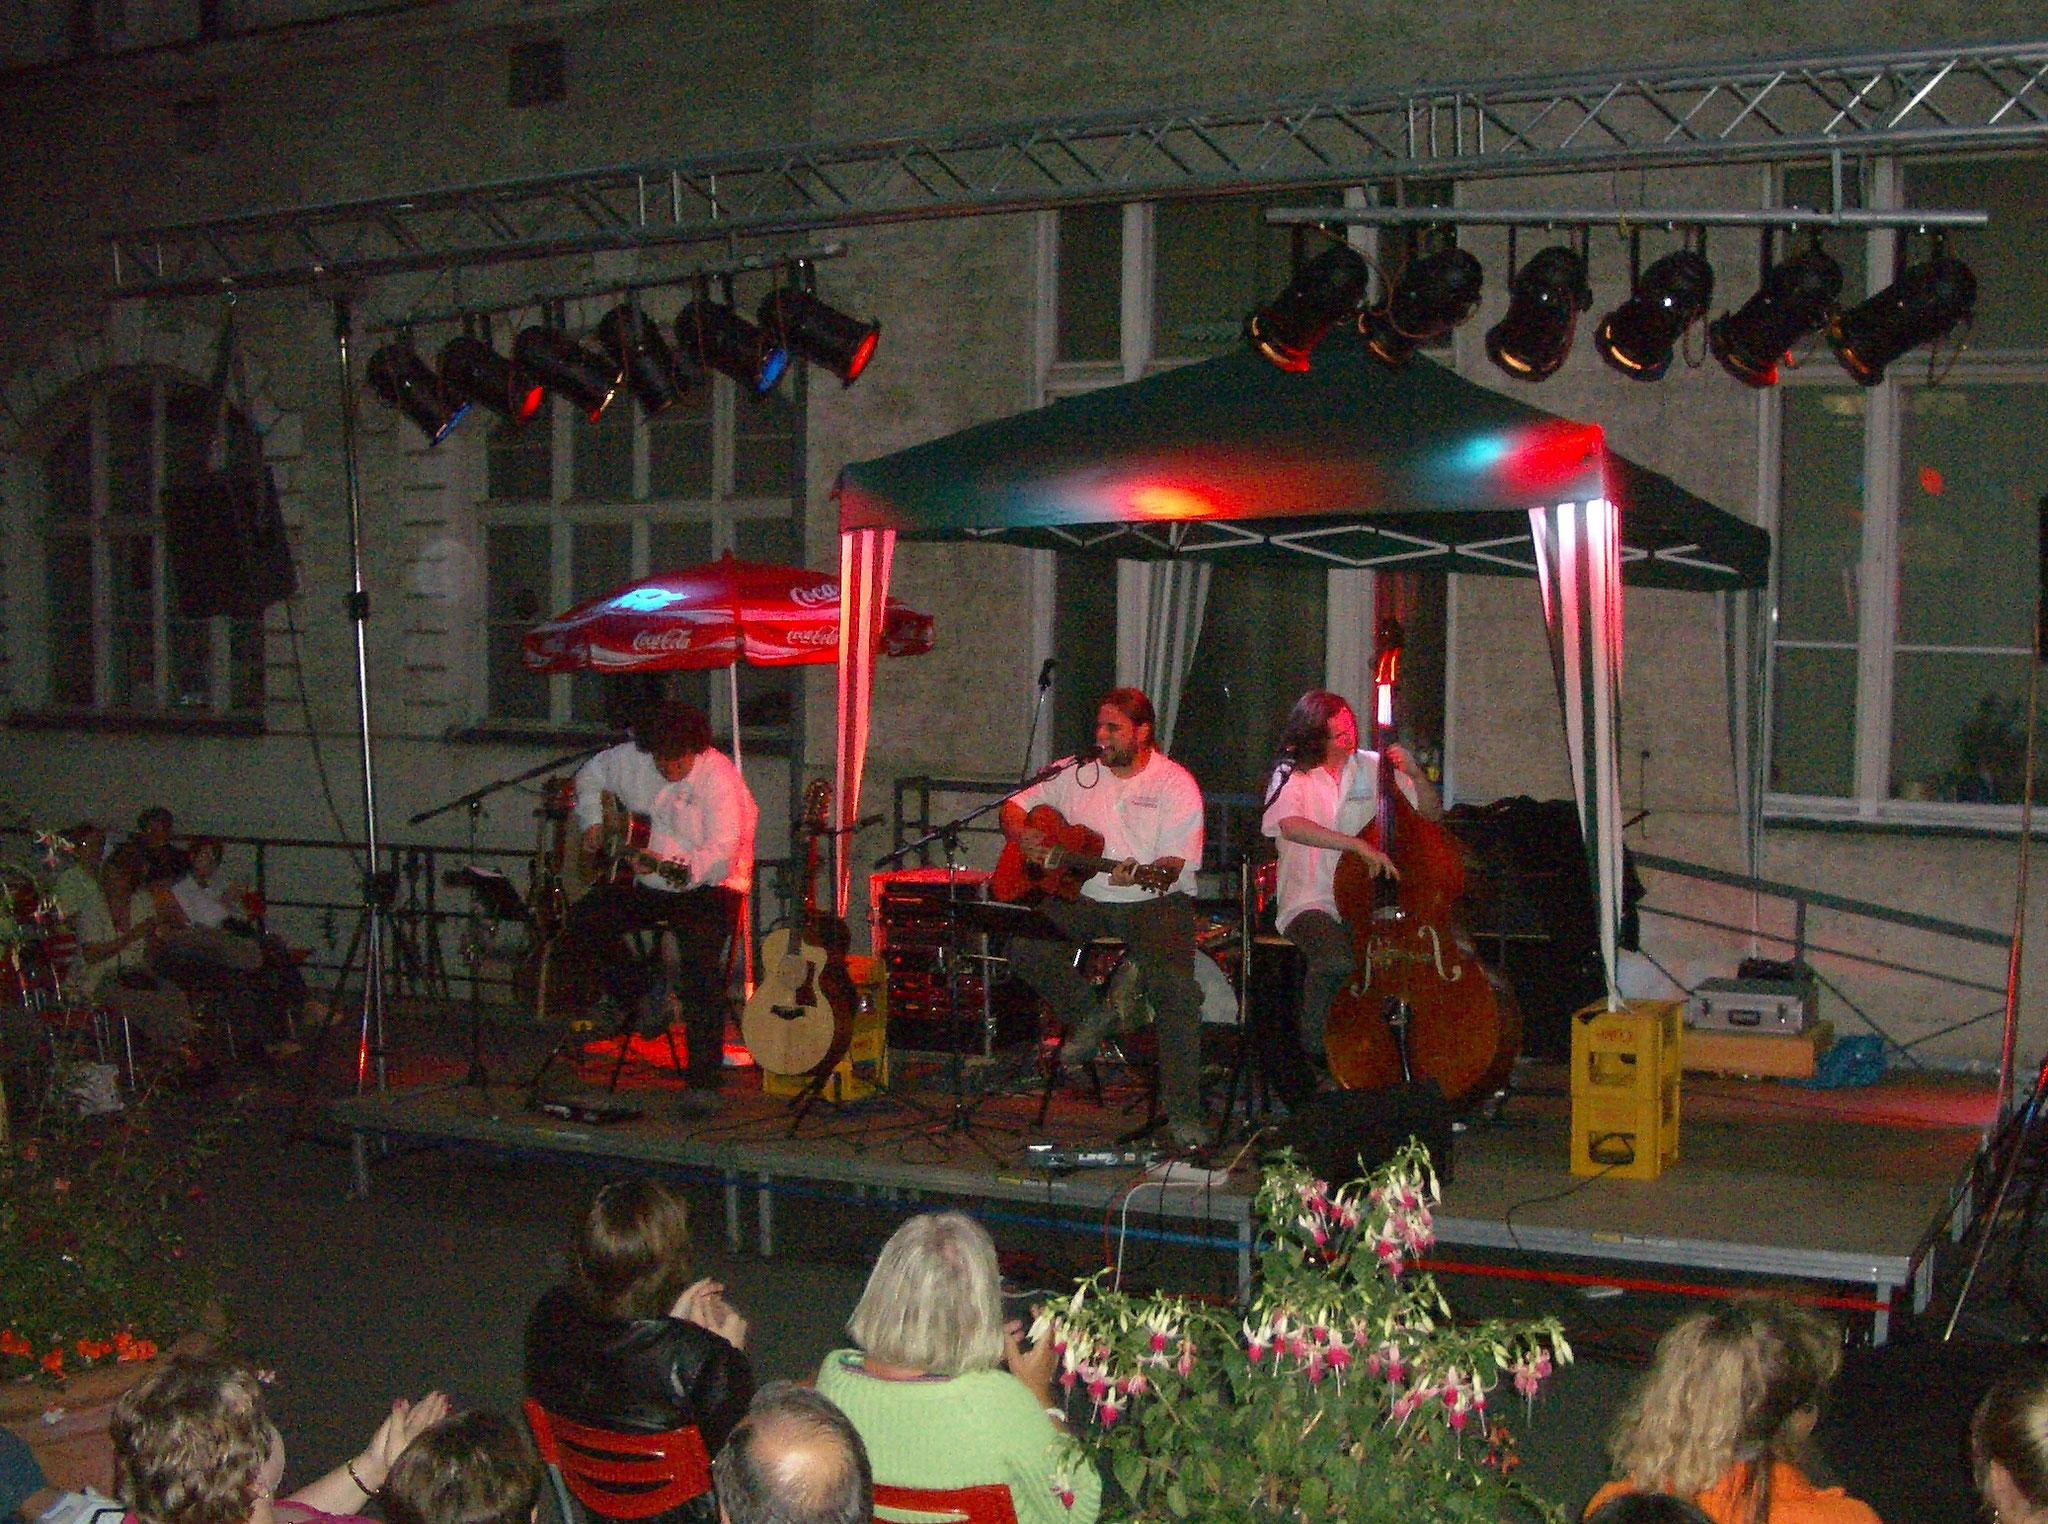 Konzerte im Bürgerhof 2006 Acoustic Revolution - Freiwilligen-Zentrum Augsburg - Foto: Wolfgang F. Lightmaster